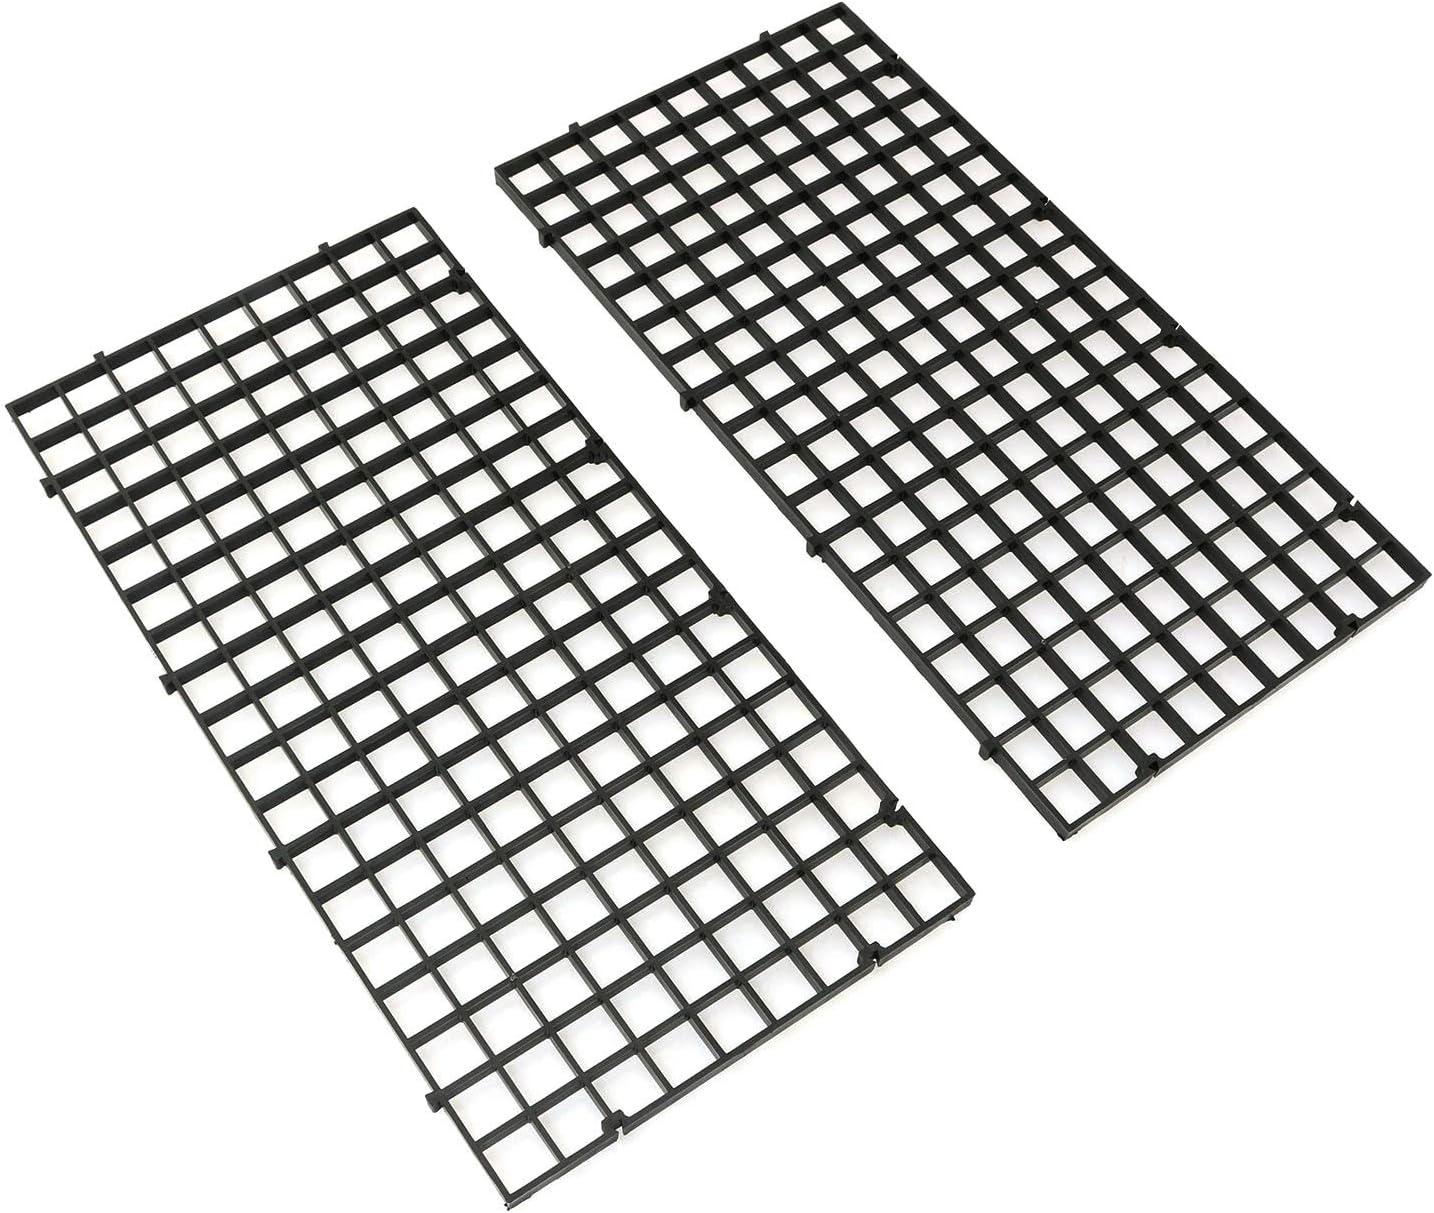 RLECS 2pcs 30cm x 15cm Plastic Grid Divider Tray Egg Crate Louvre Aquarium Fish Tank Bottom Isolation, Black